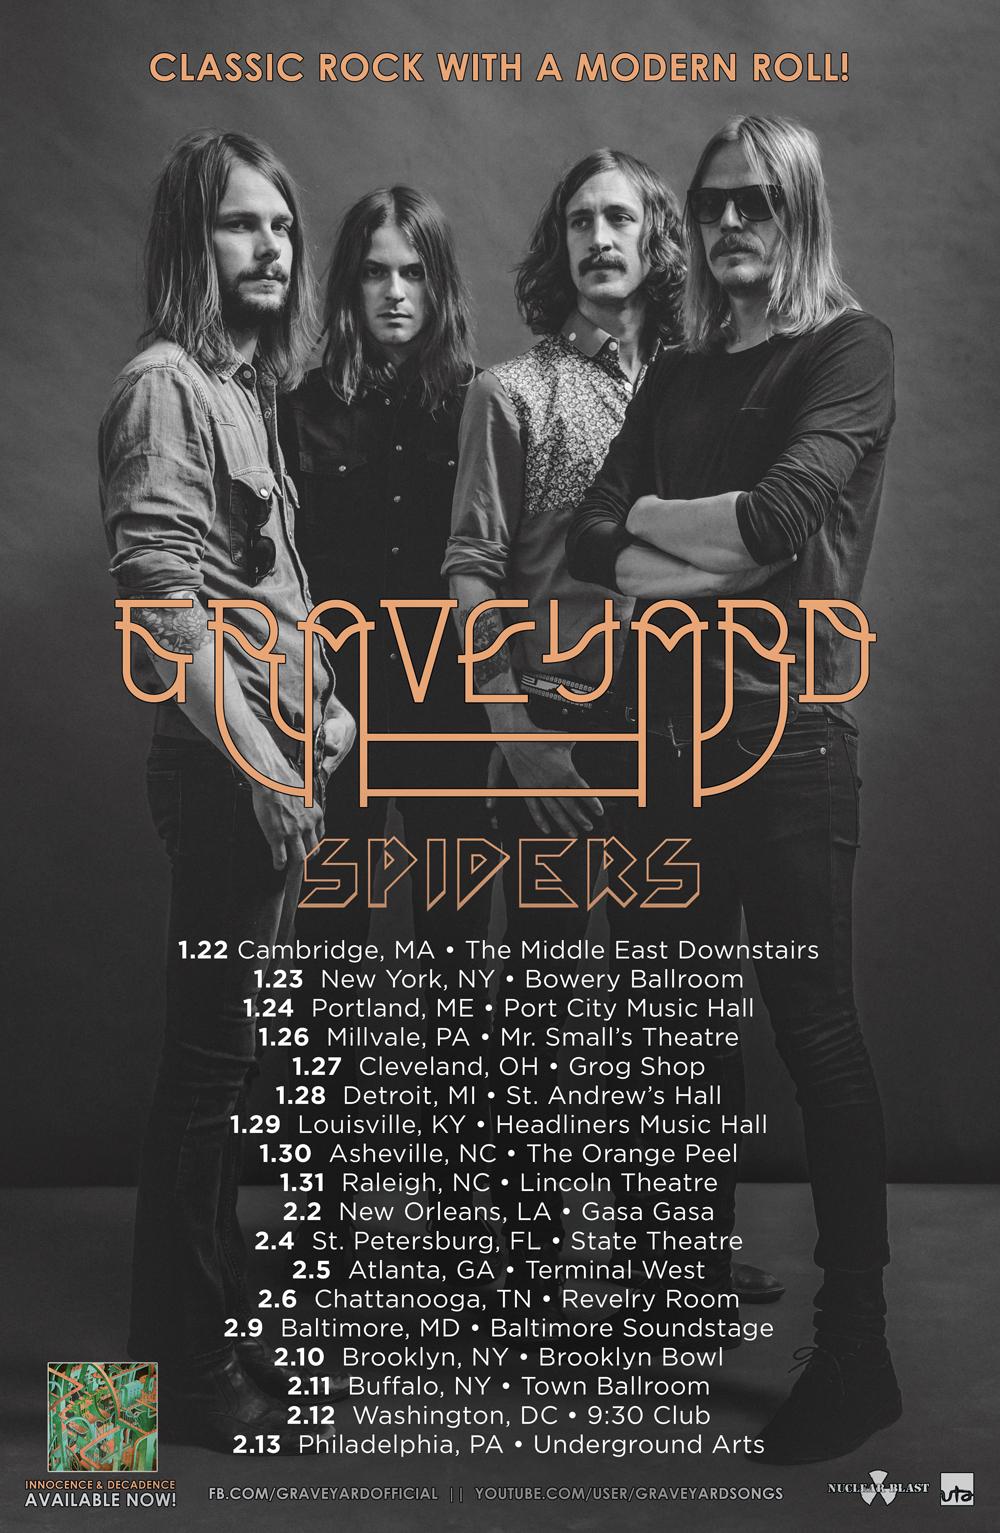 Graveyard Spiders US tour